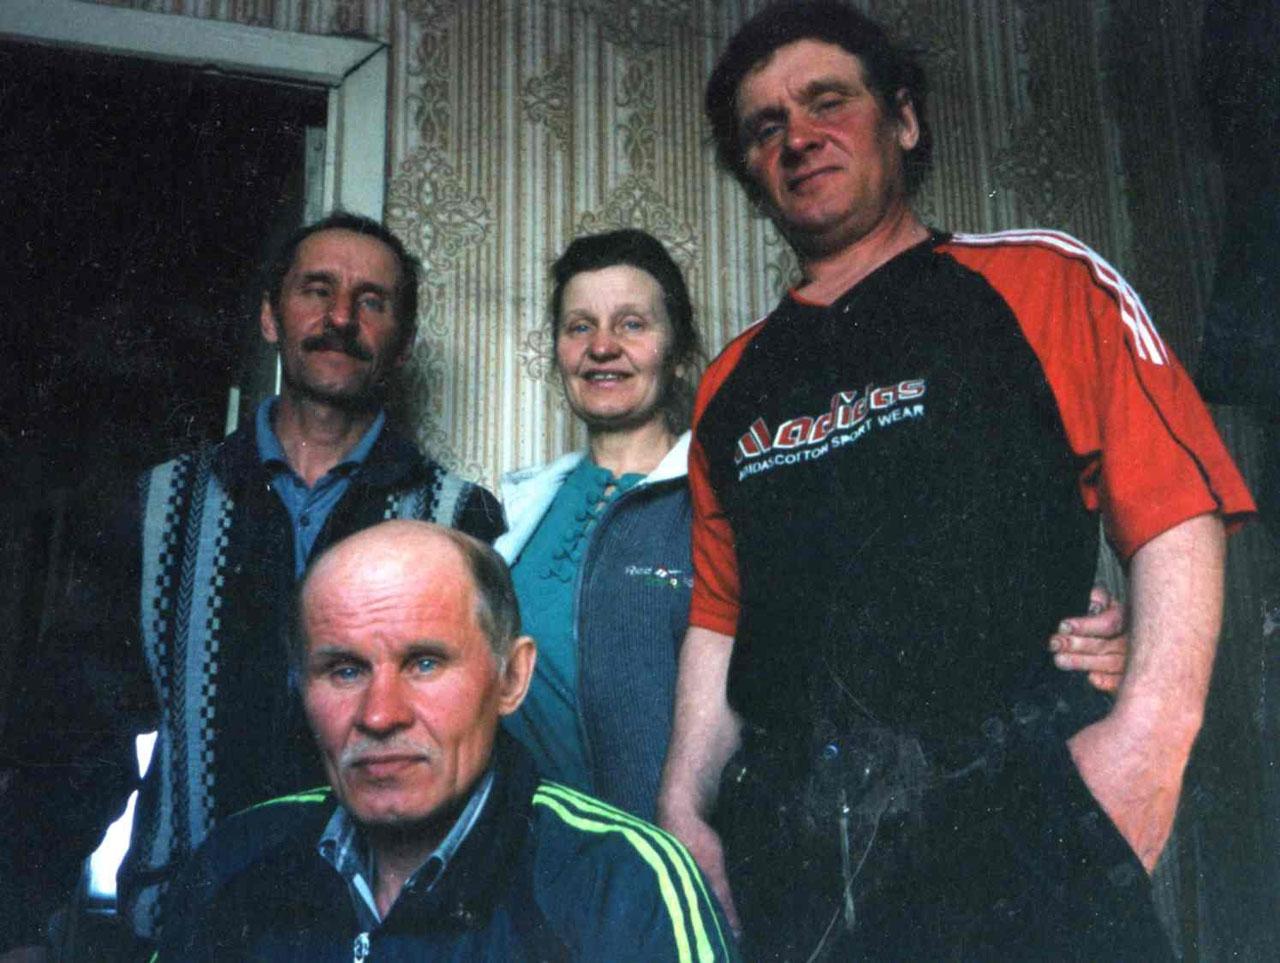 Семья Цветковых (справа налево) - Николай, Галина Александровна Алексеева (Цветкова), Александр и Владимир.